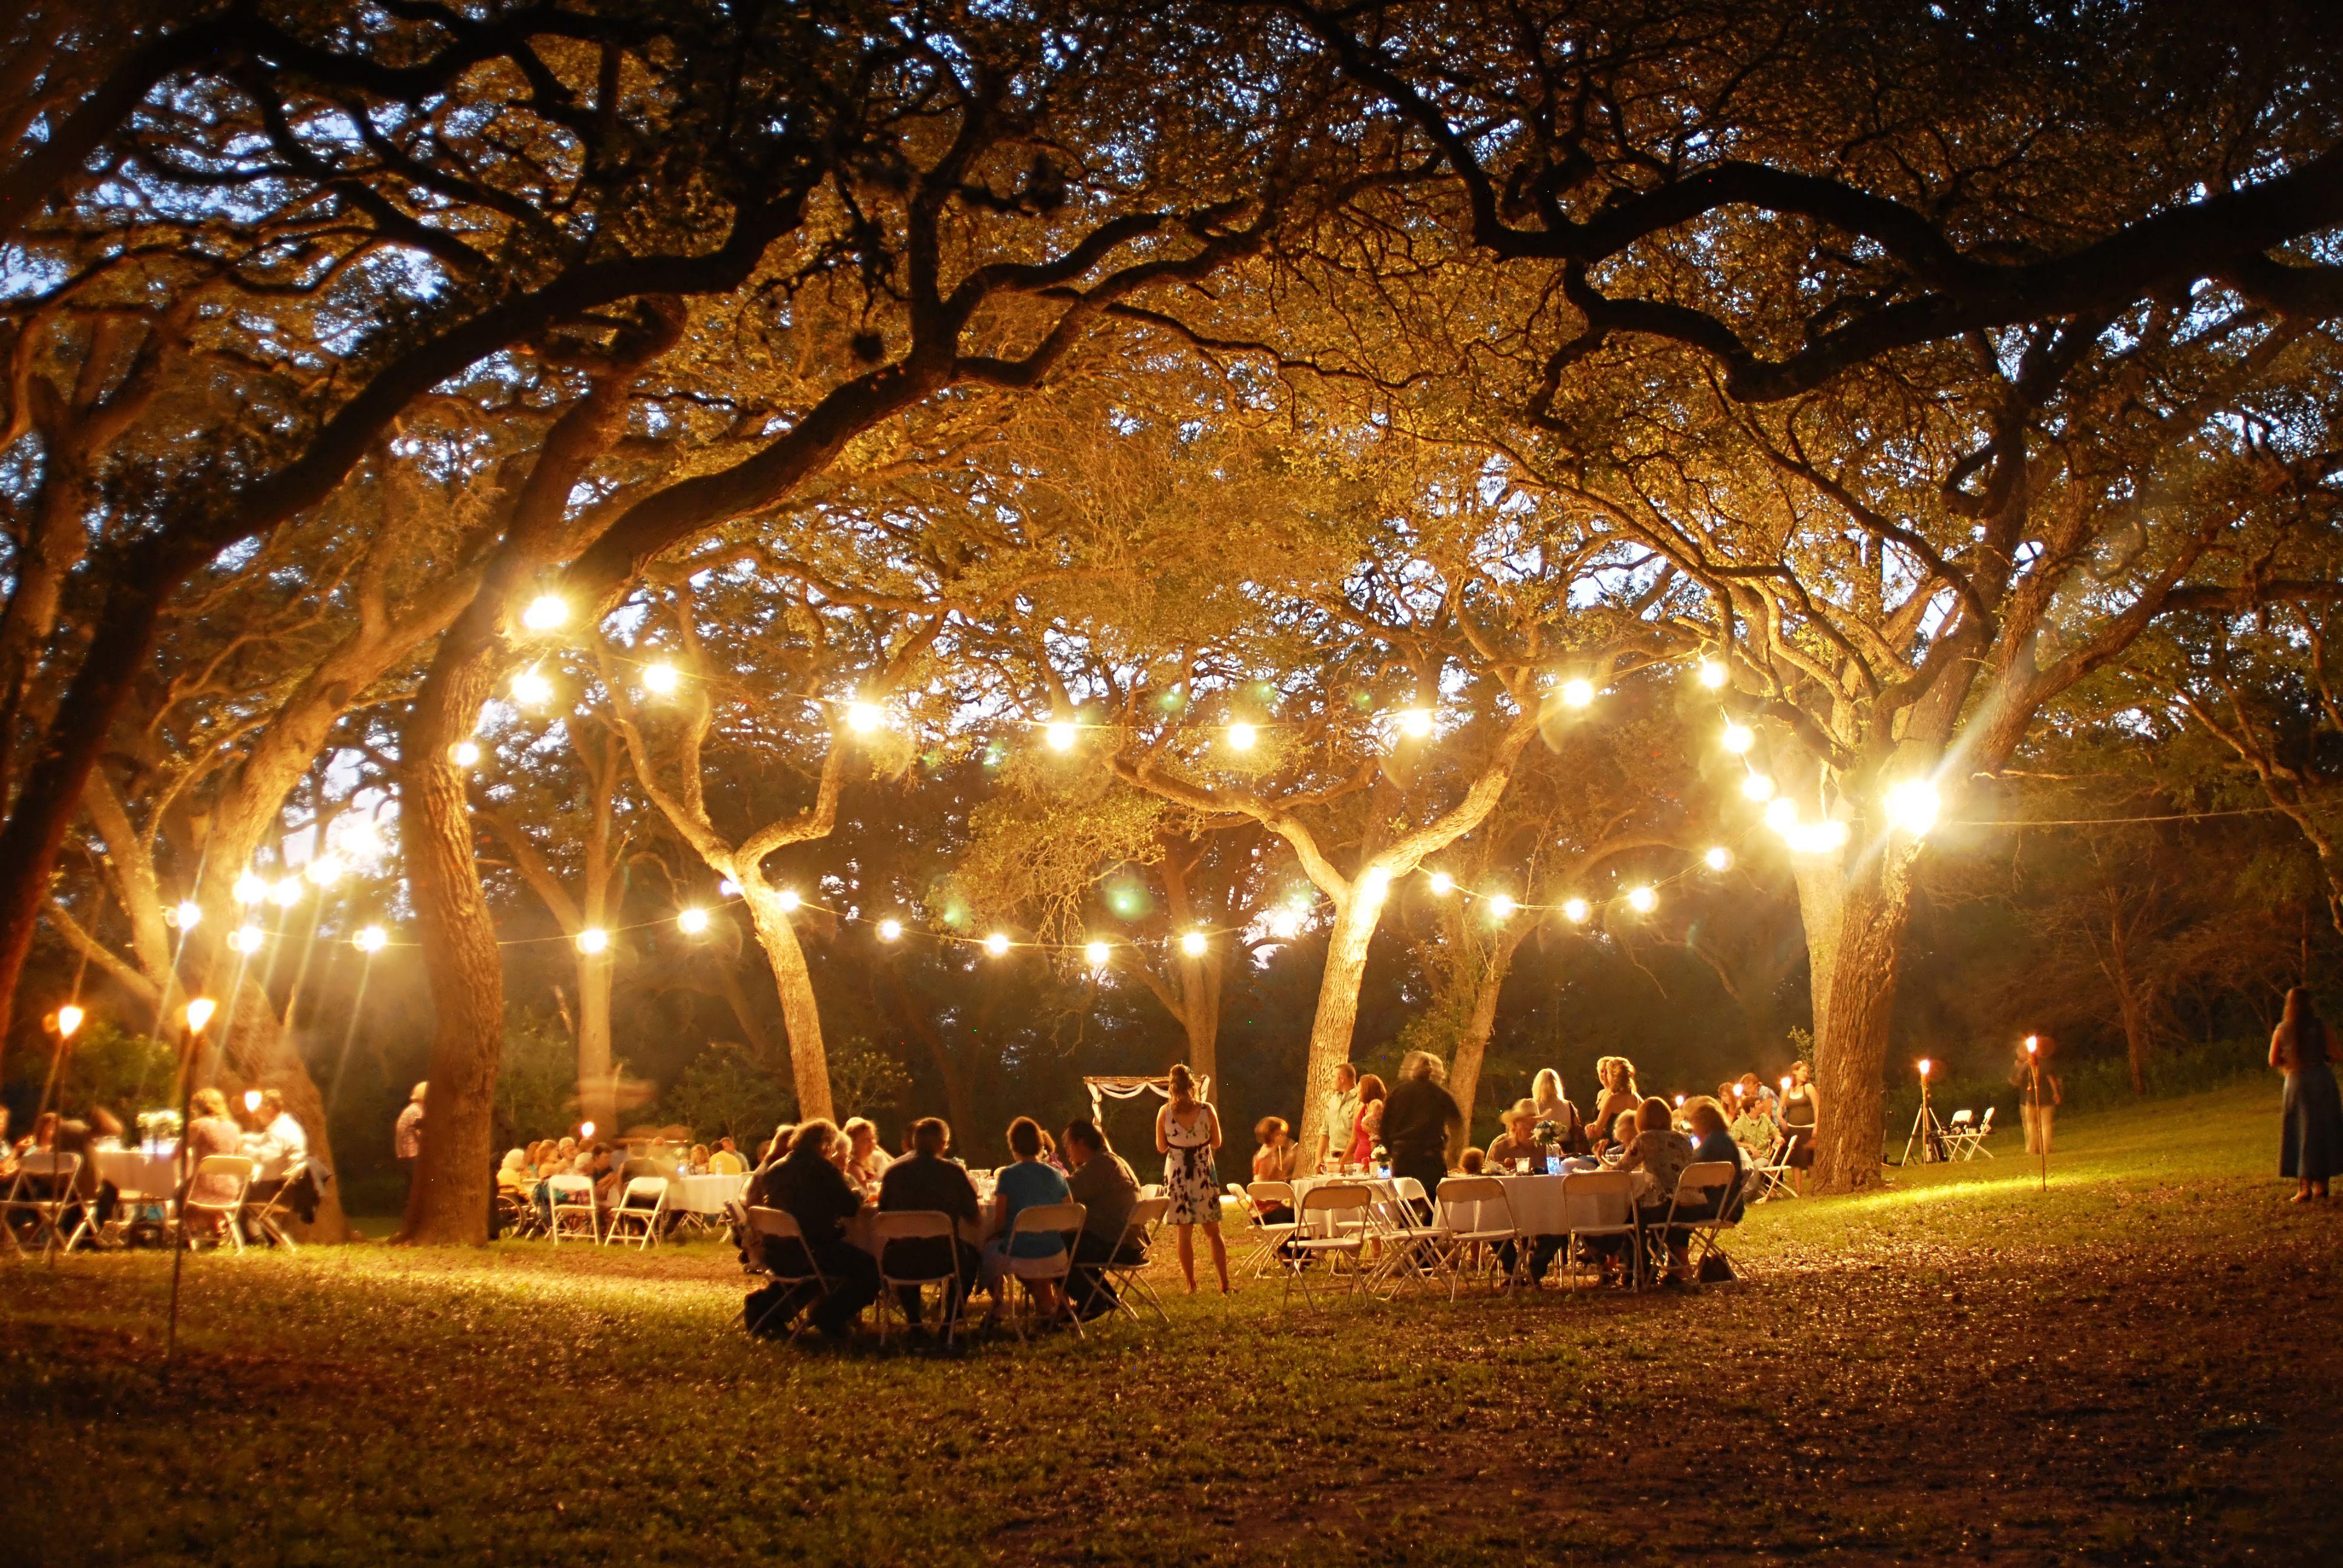 outdoor wedding reception under lights in oak trees at vintage